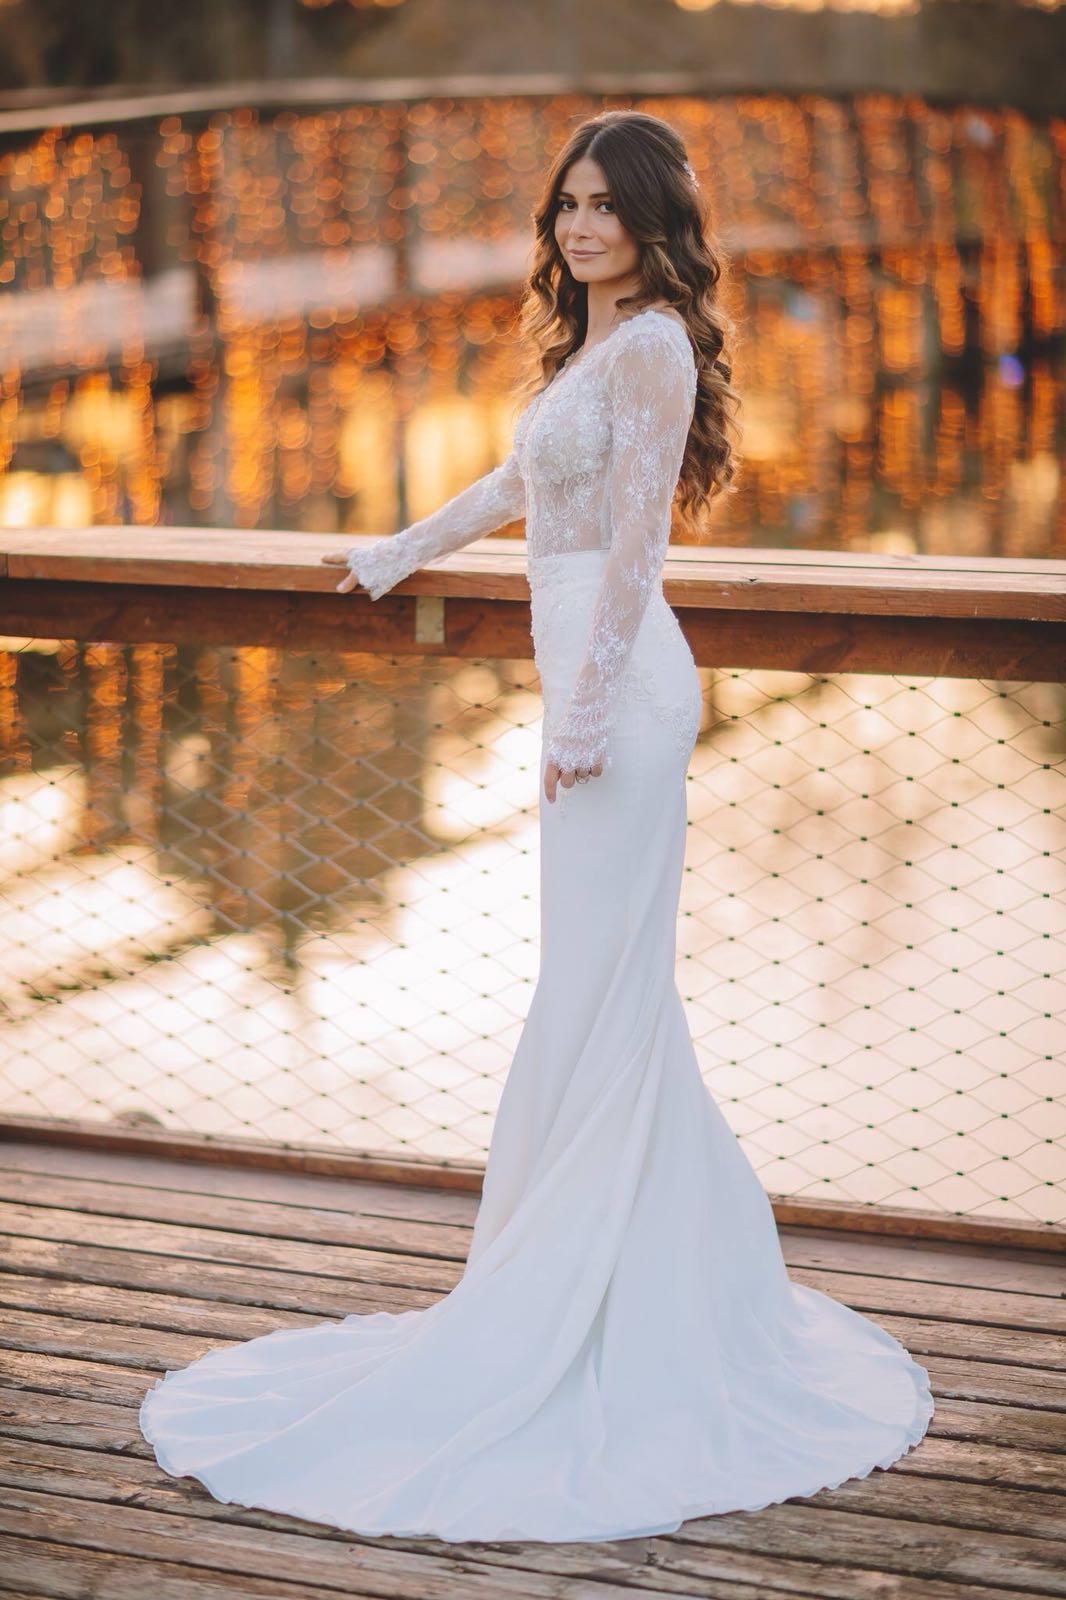 alessia-solidani-blog-matrimonio-tel-aviv